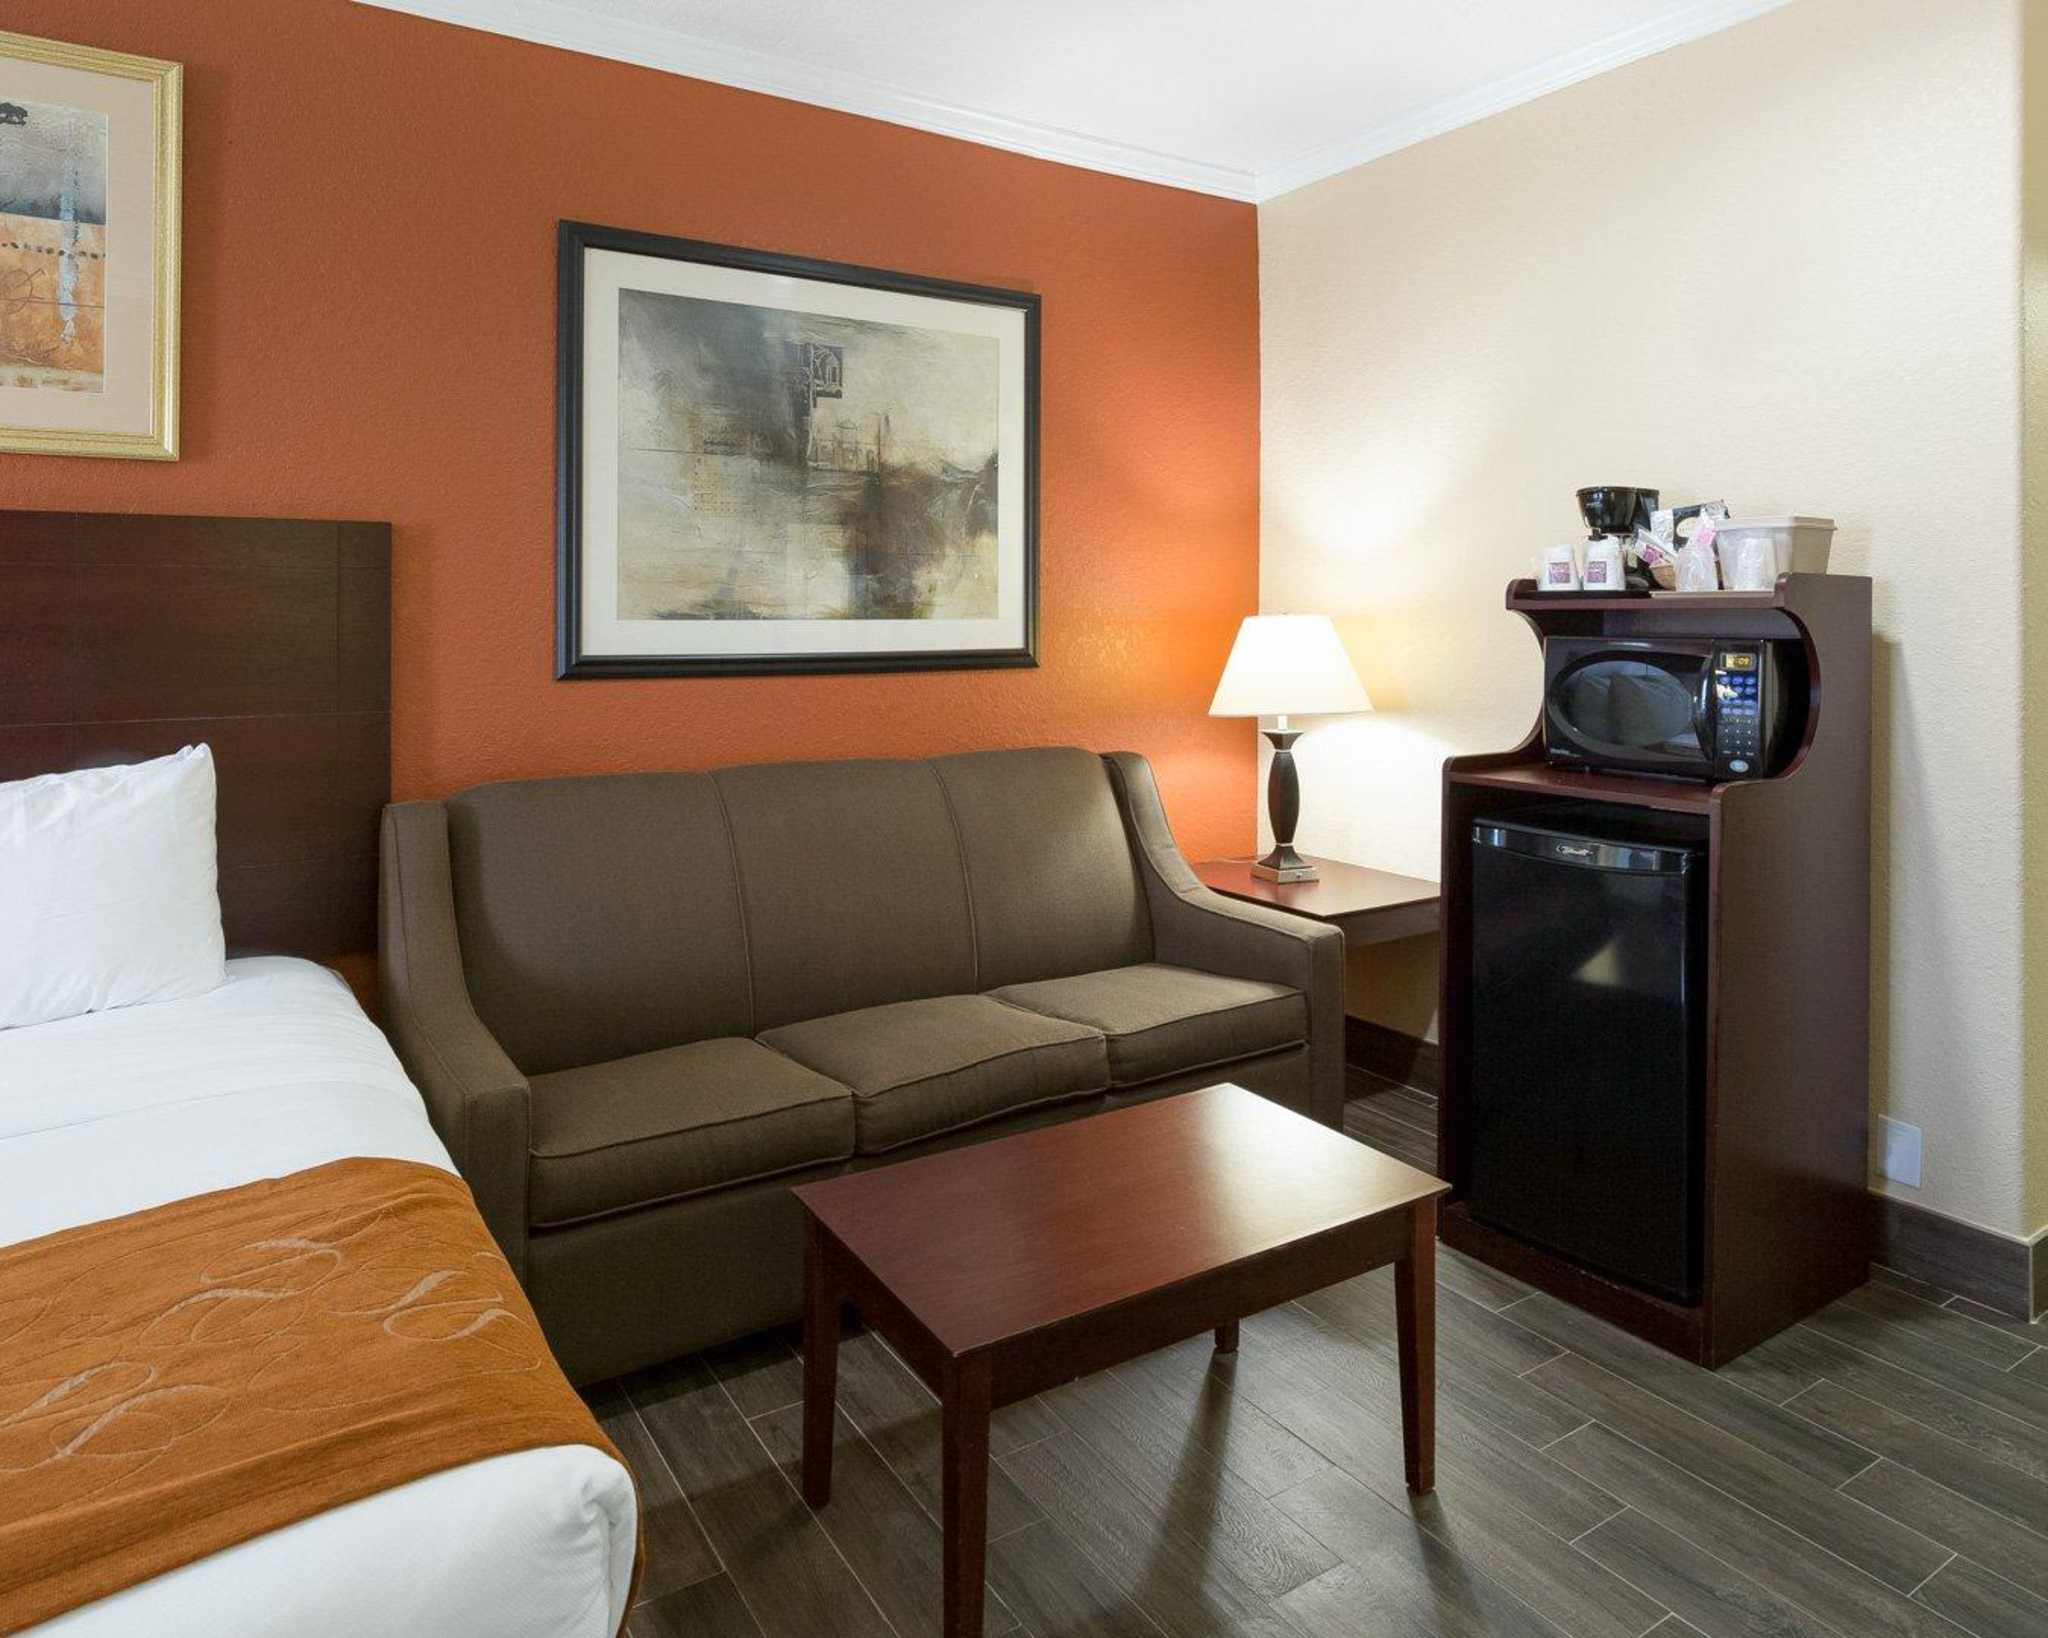 Comfort Suites image 35